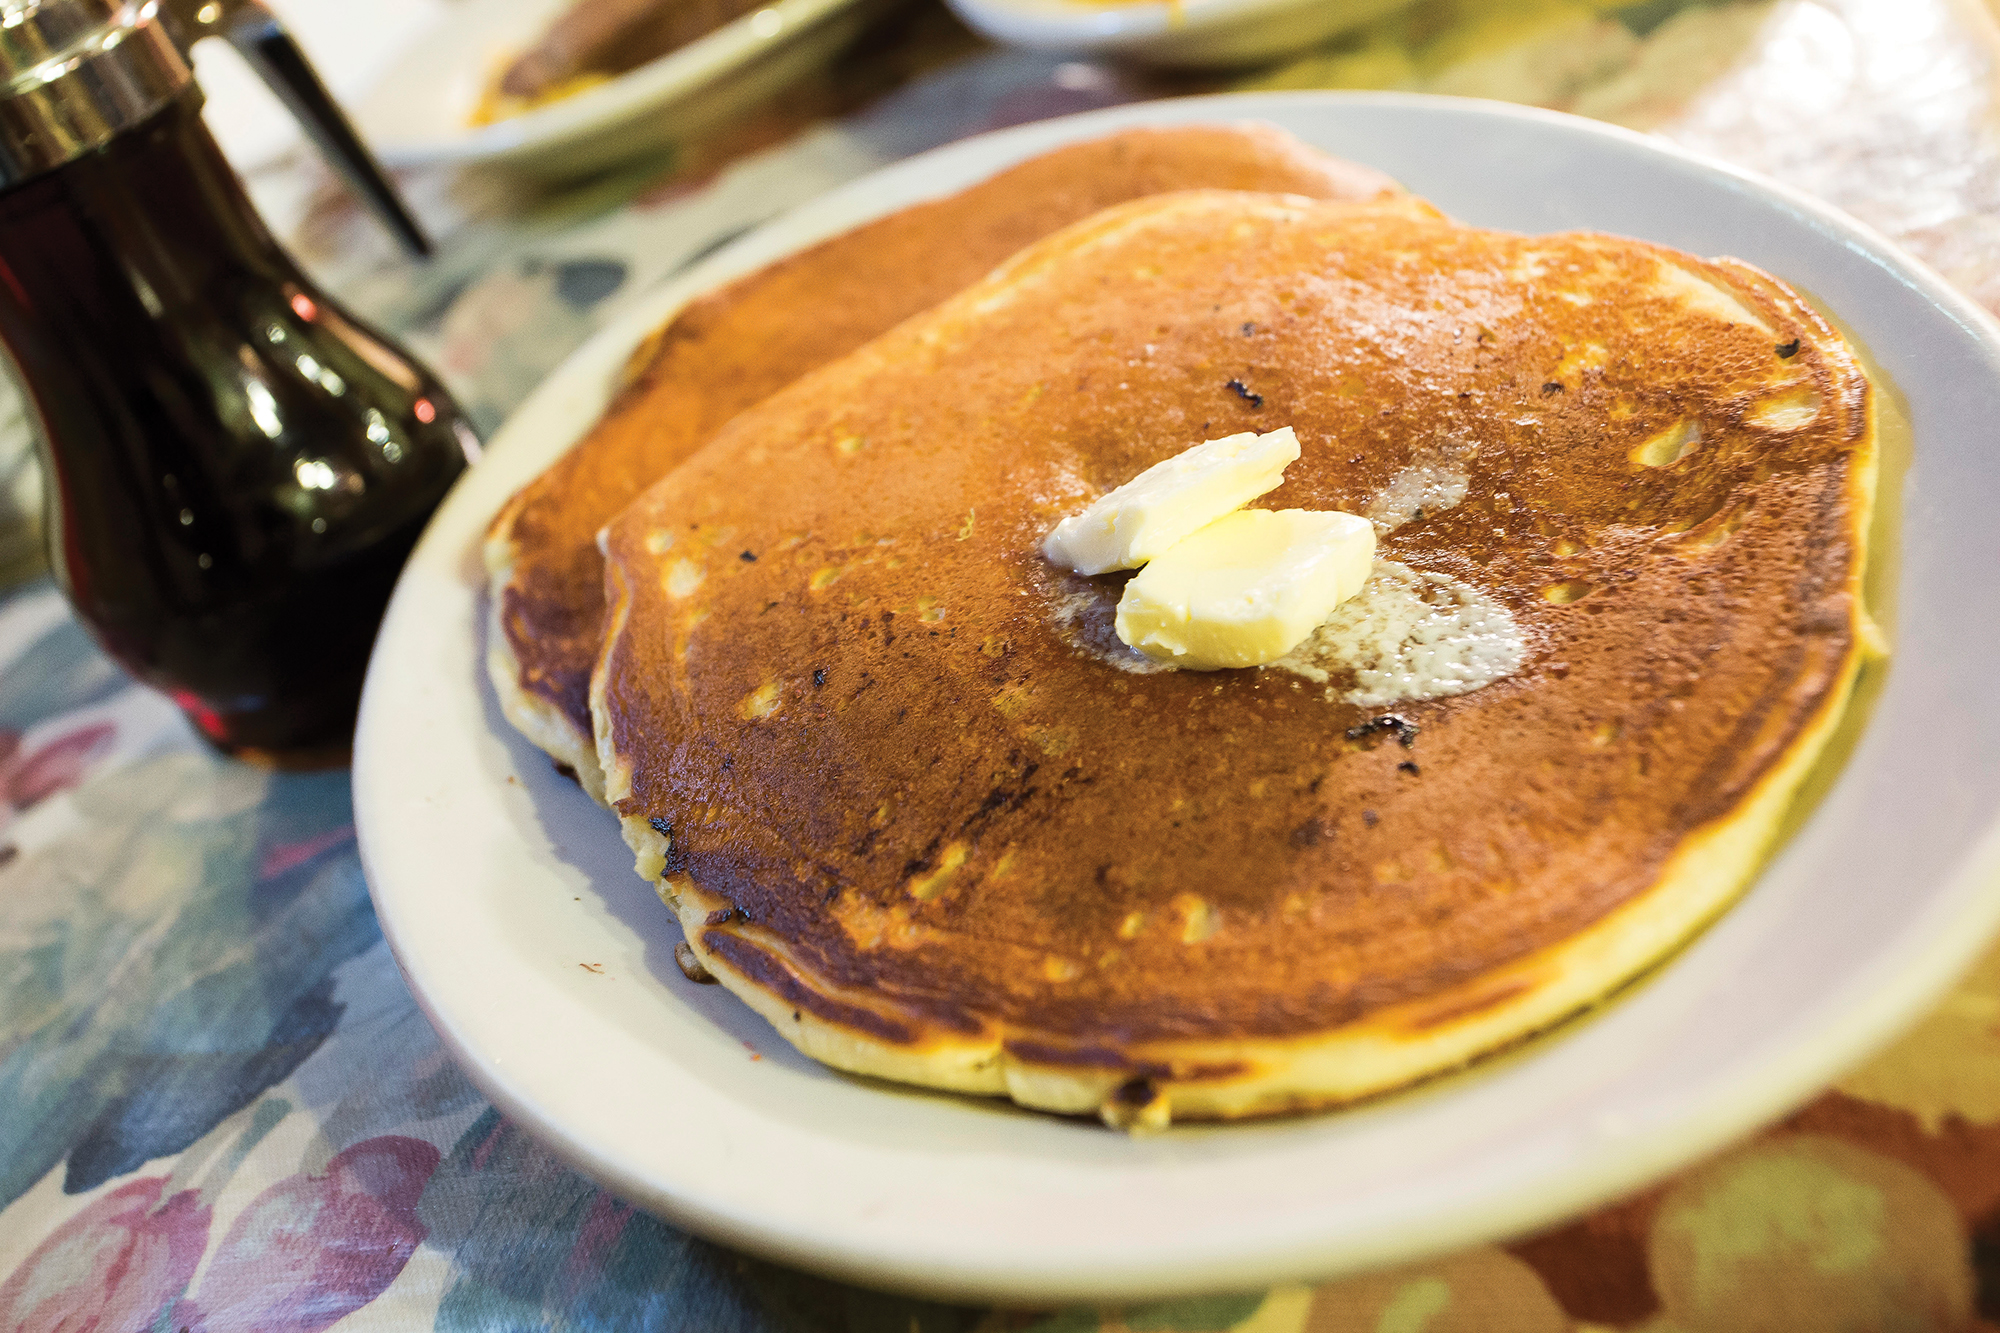 Mud Street Café's sour cream pancakes